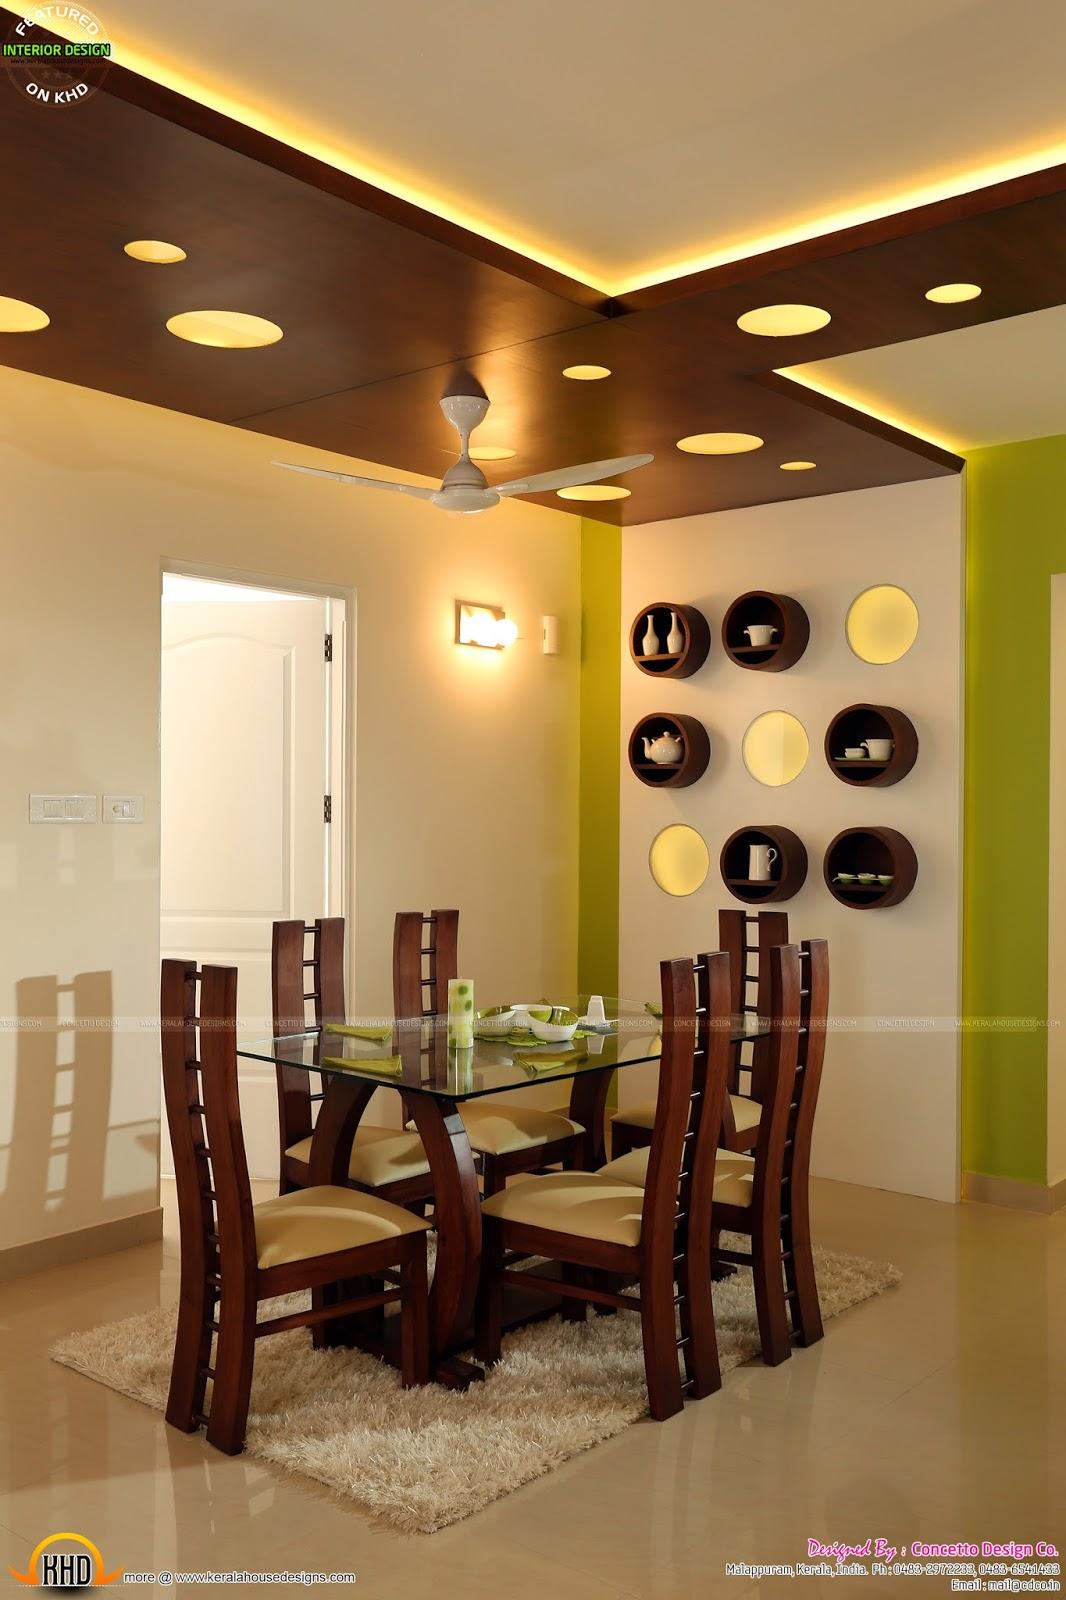 Kerala flat interior design kerala home design and floor - Kerala home interior design plans ...